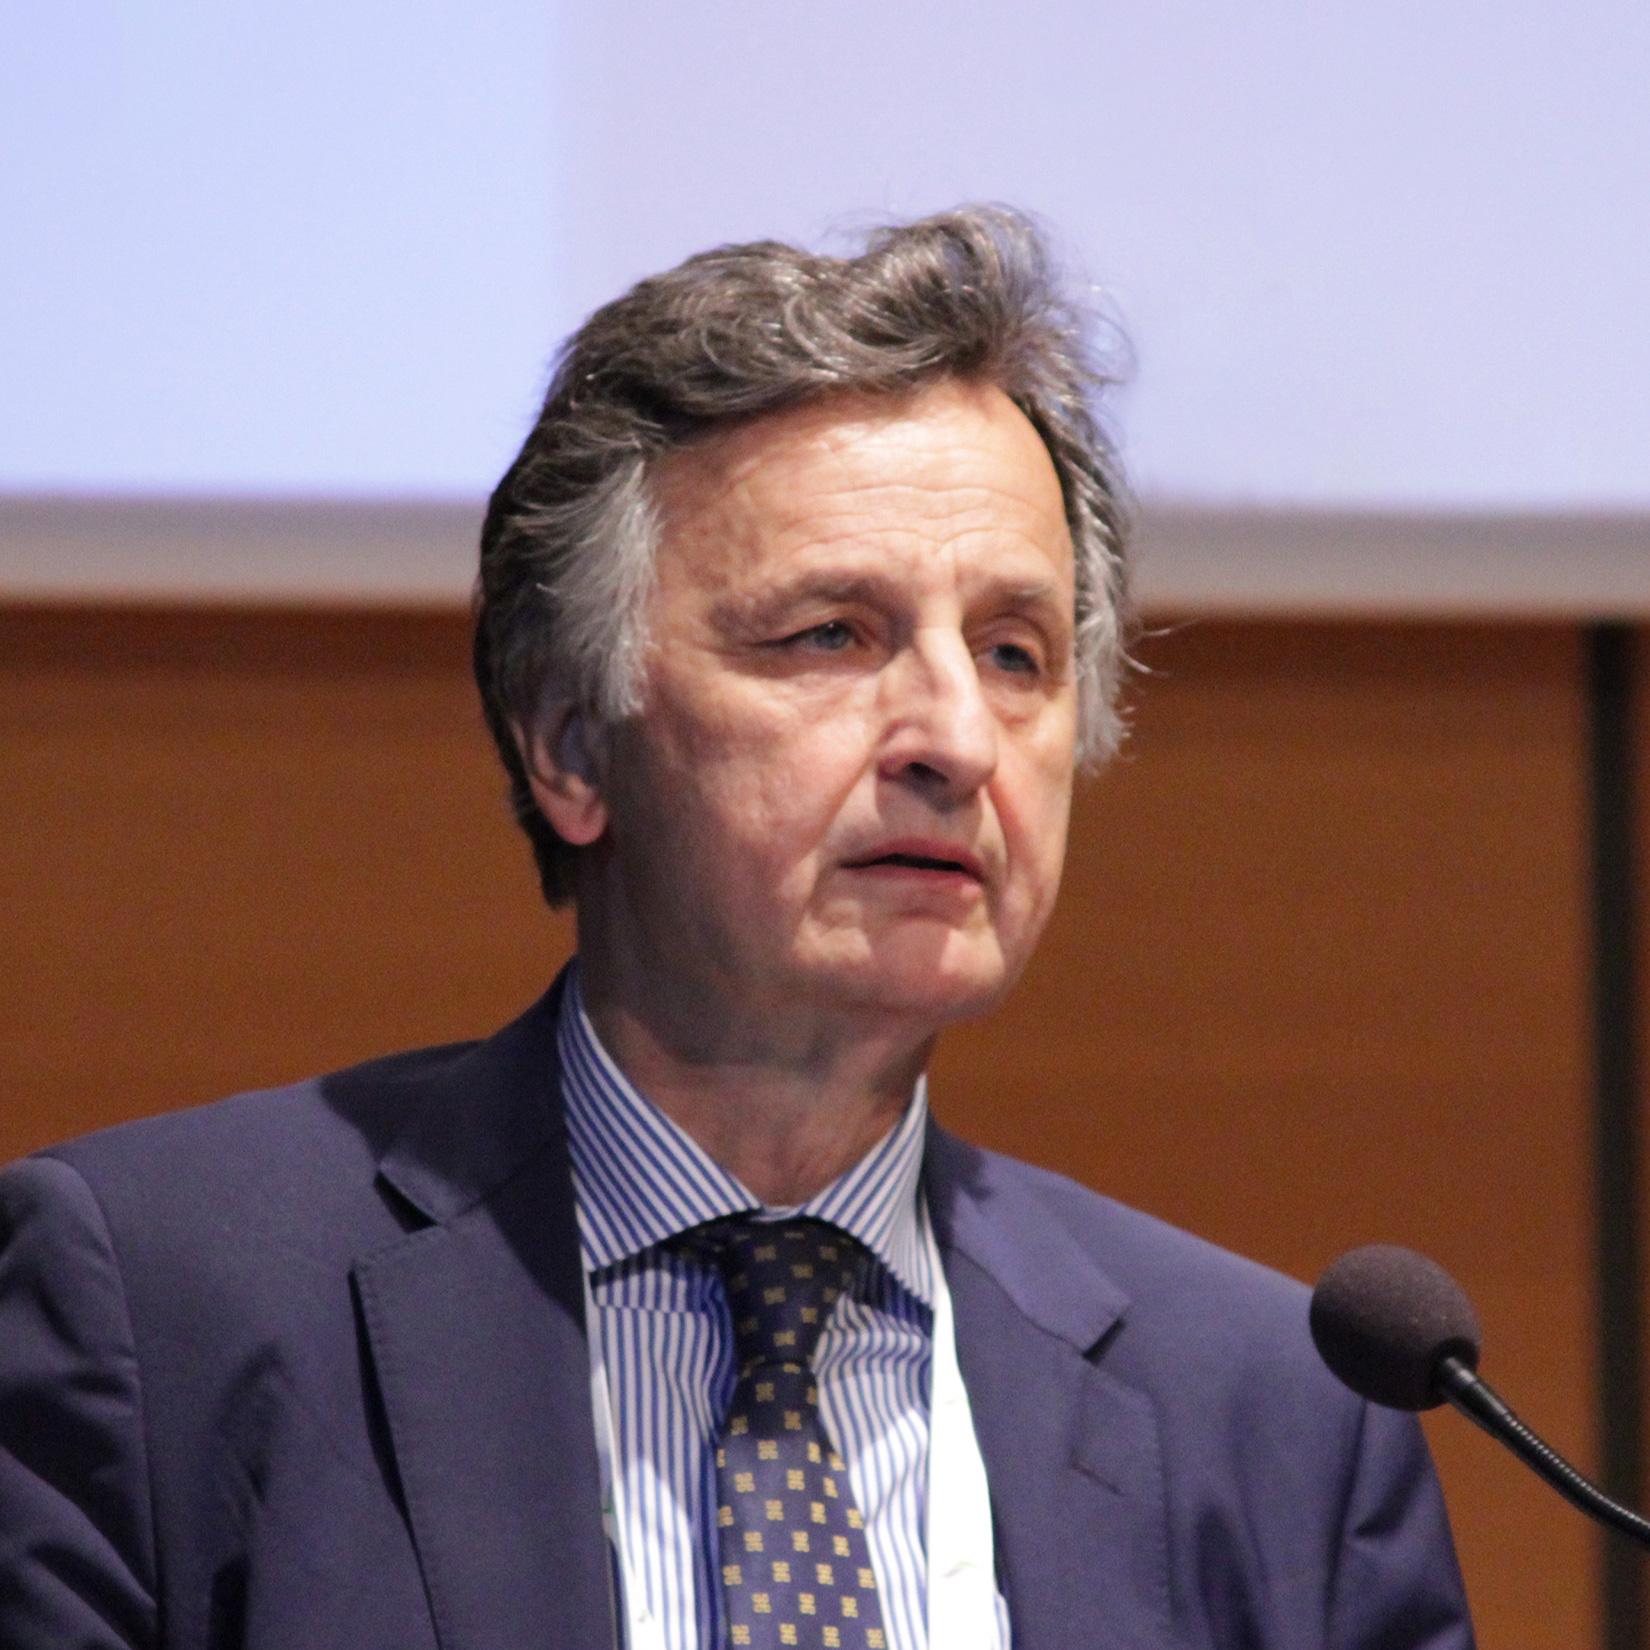 Maurizio Pernice